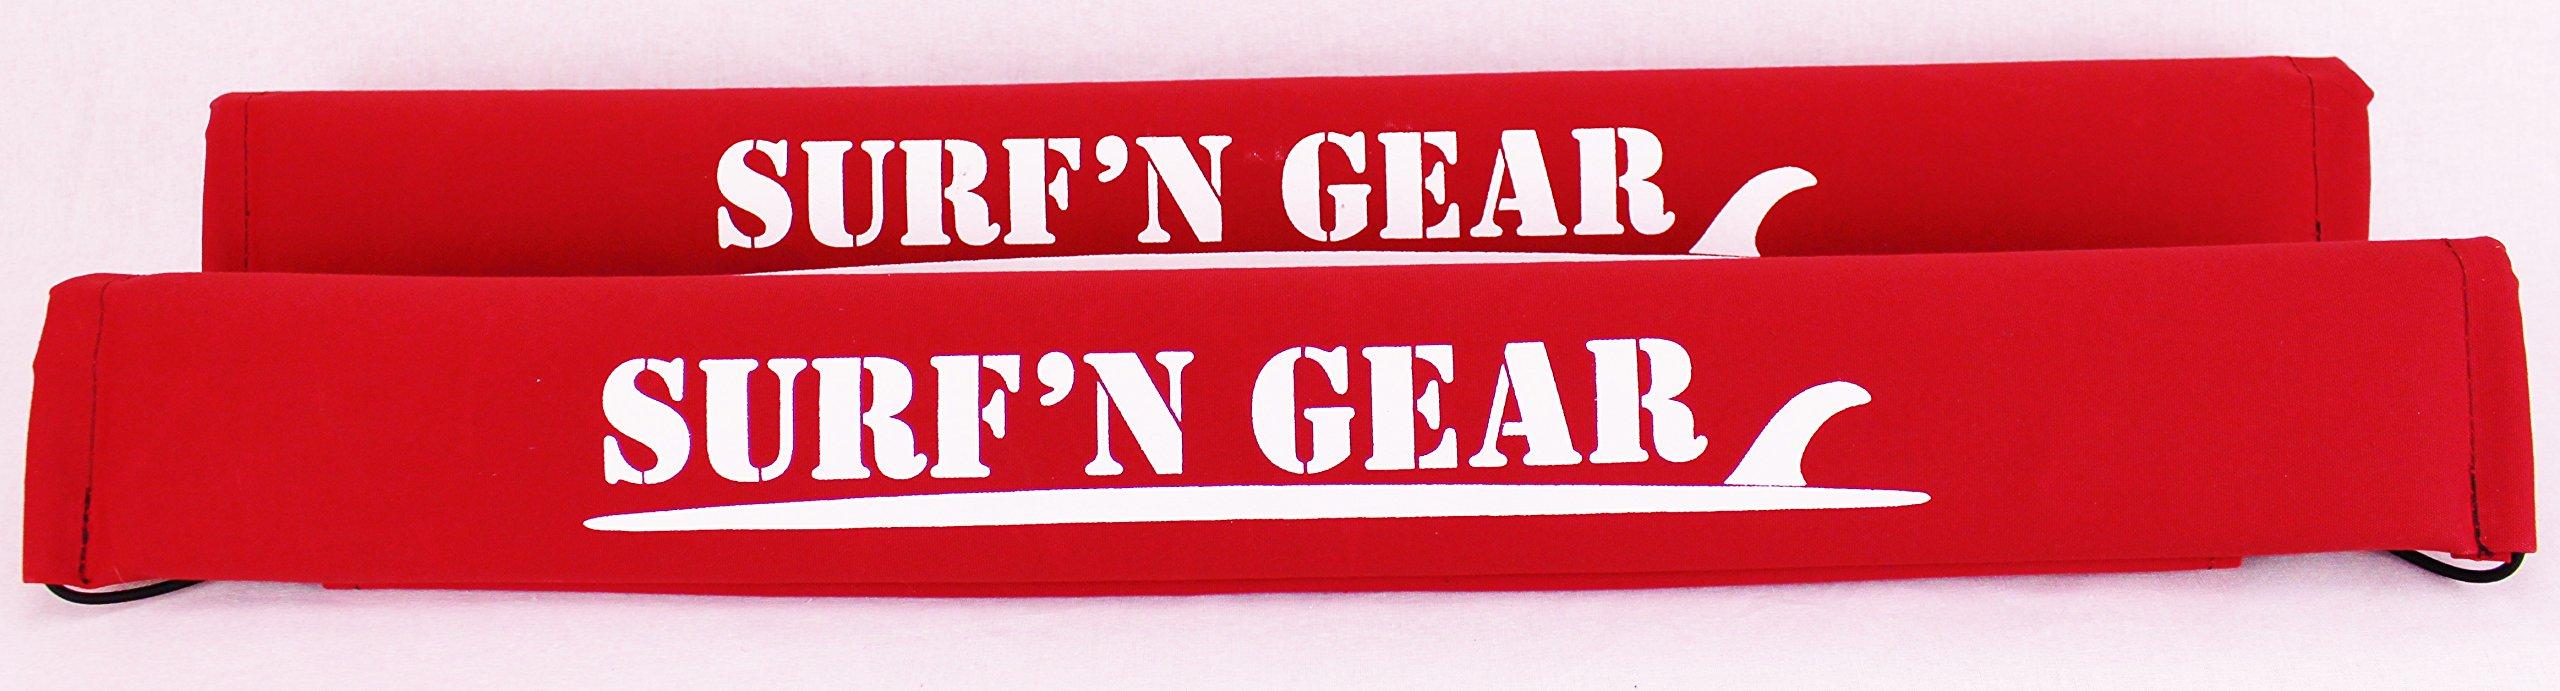 Surf'n Gear 24'' Fade Proof Regular Roof Rack Pads - Red by Surf'n Gear